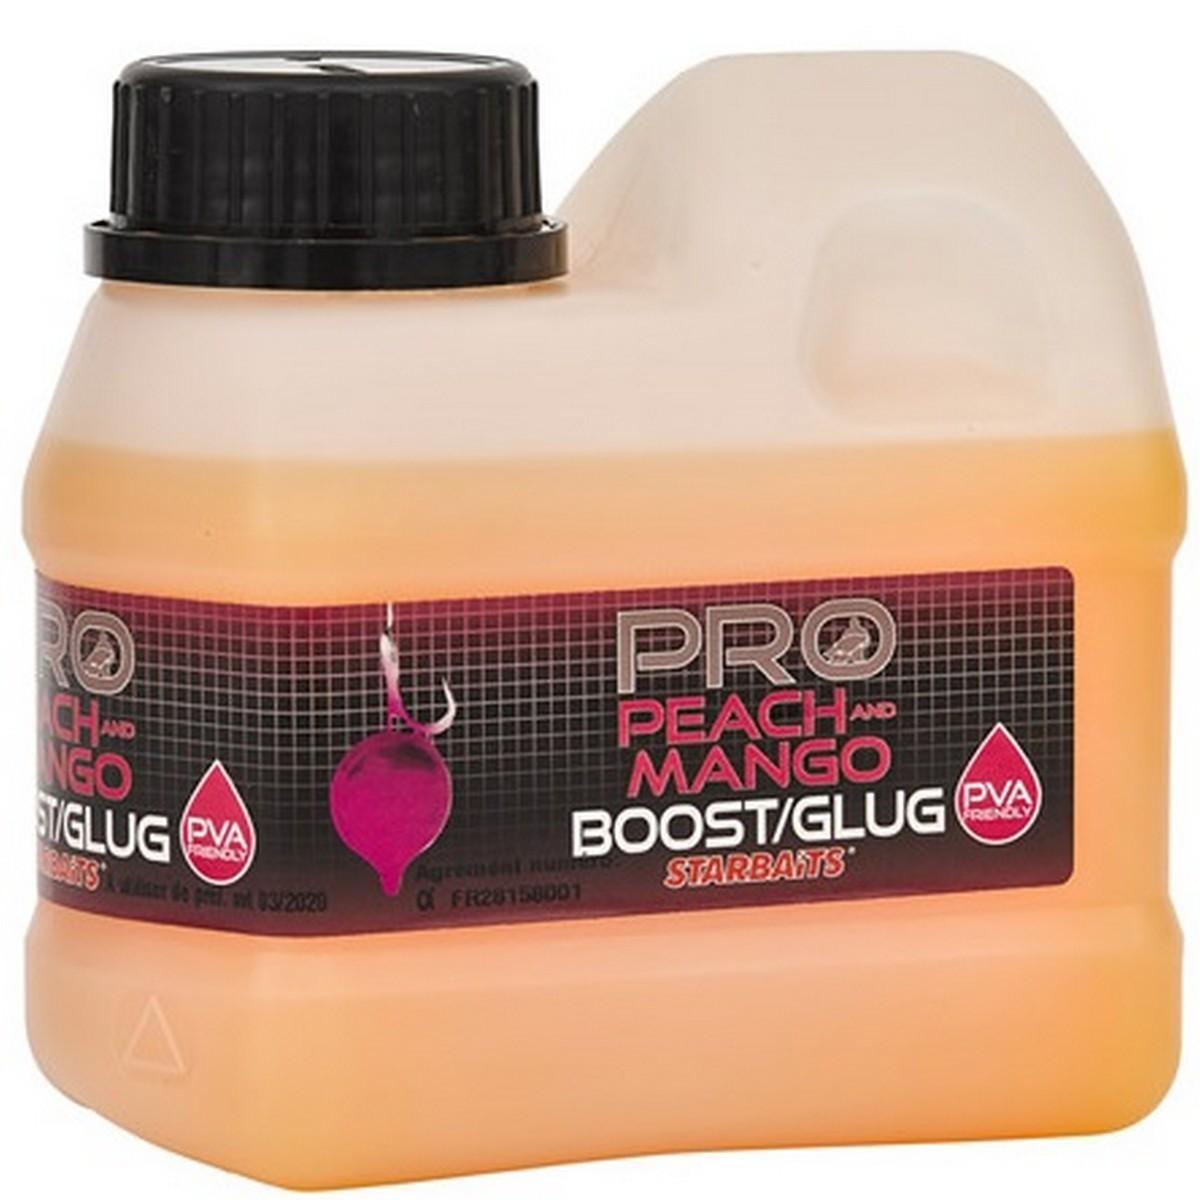 Dip StarBaits Probiotic Peach and Mango Boost Glug